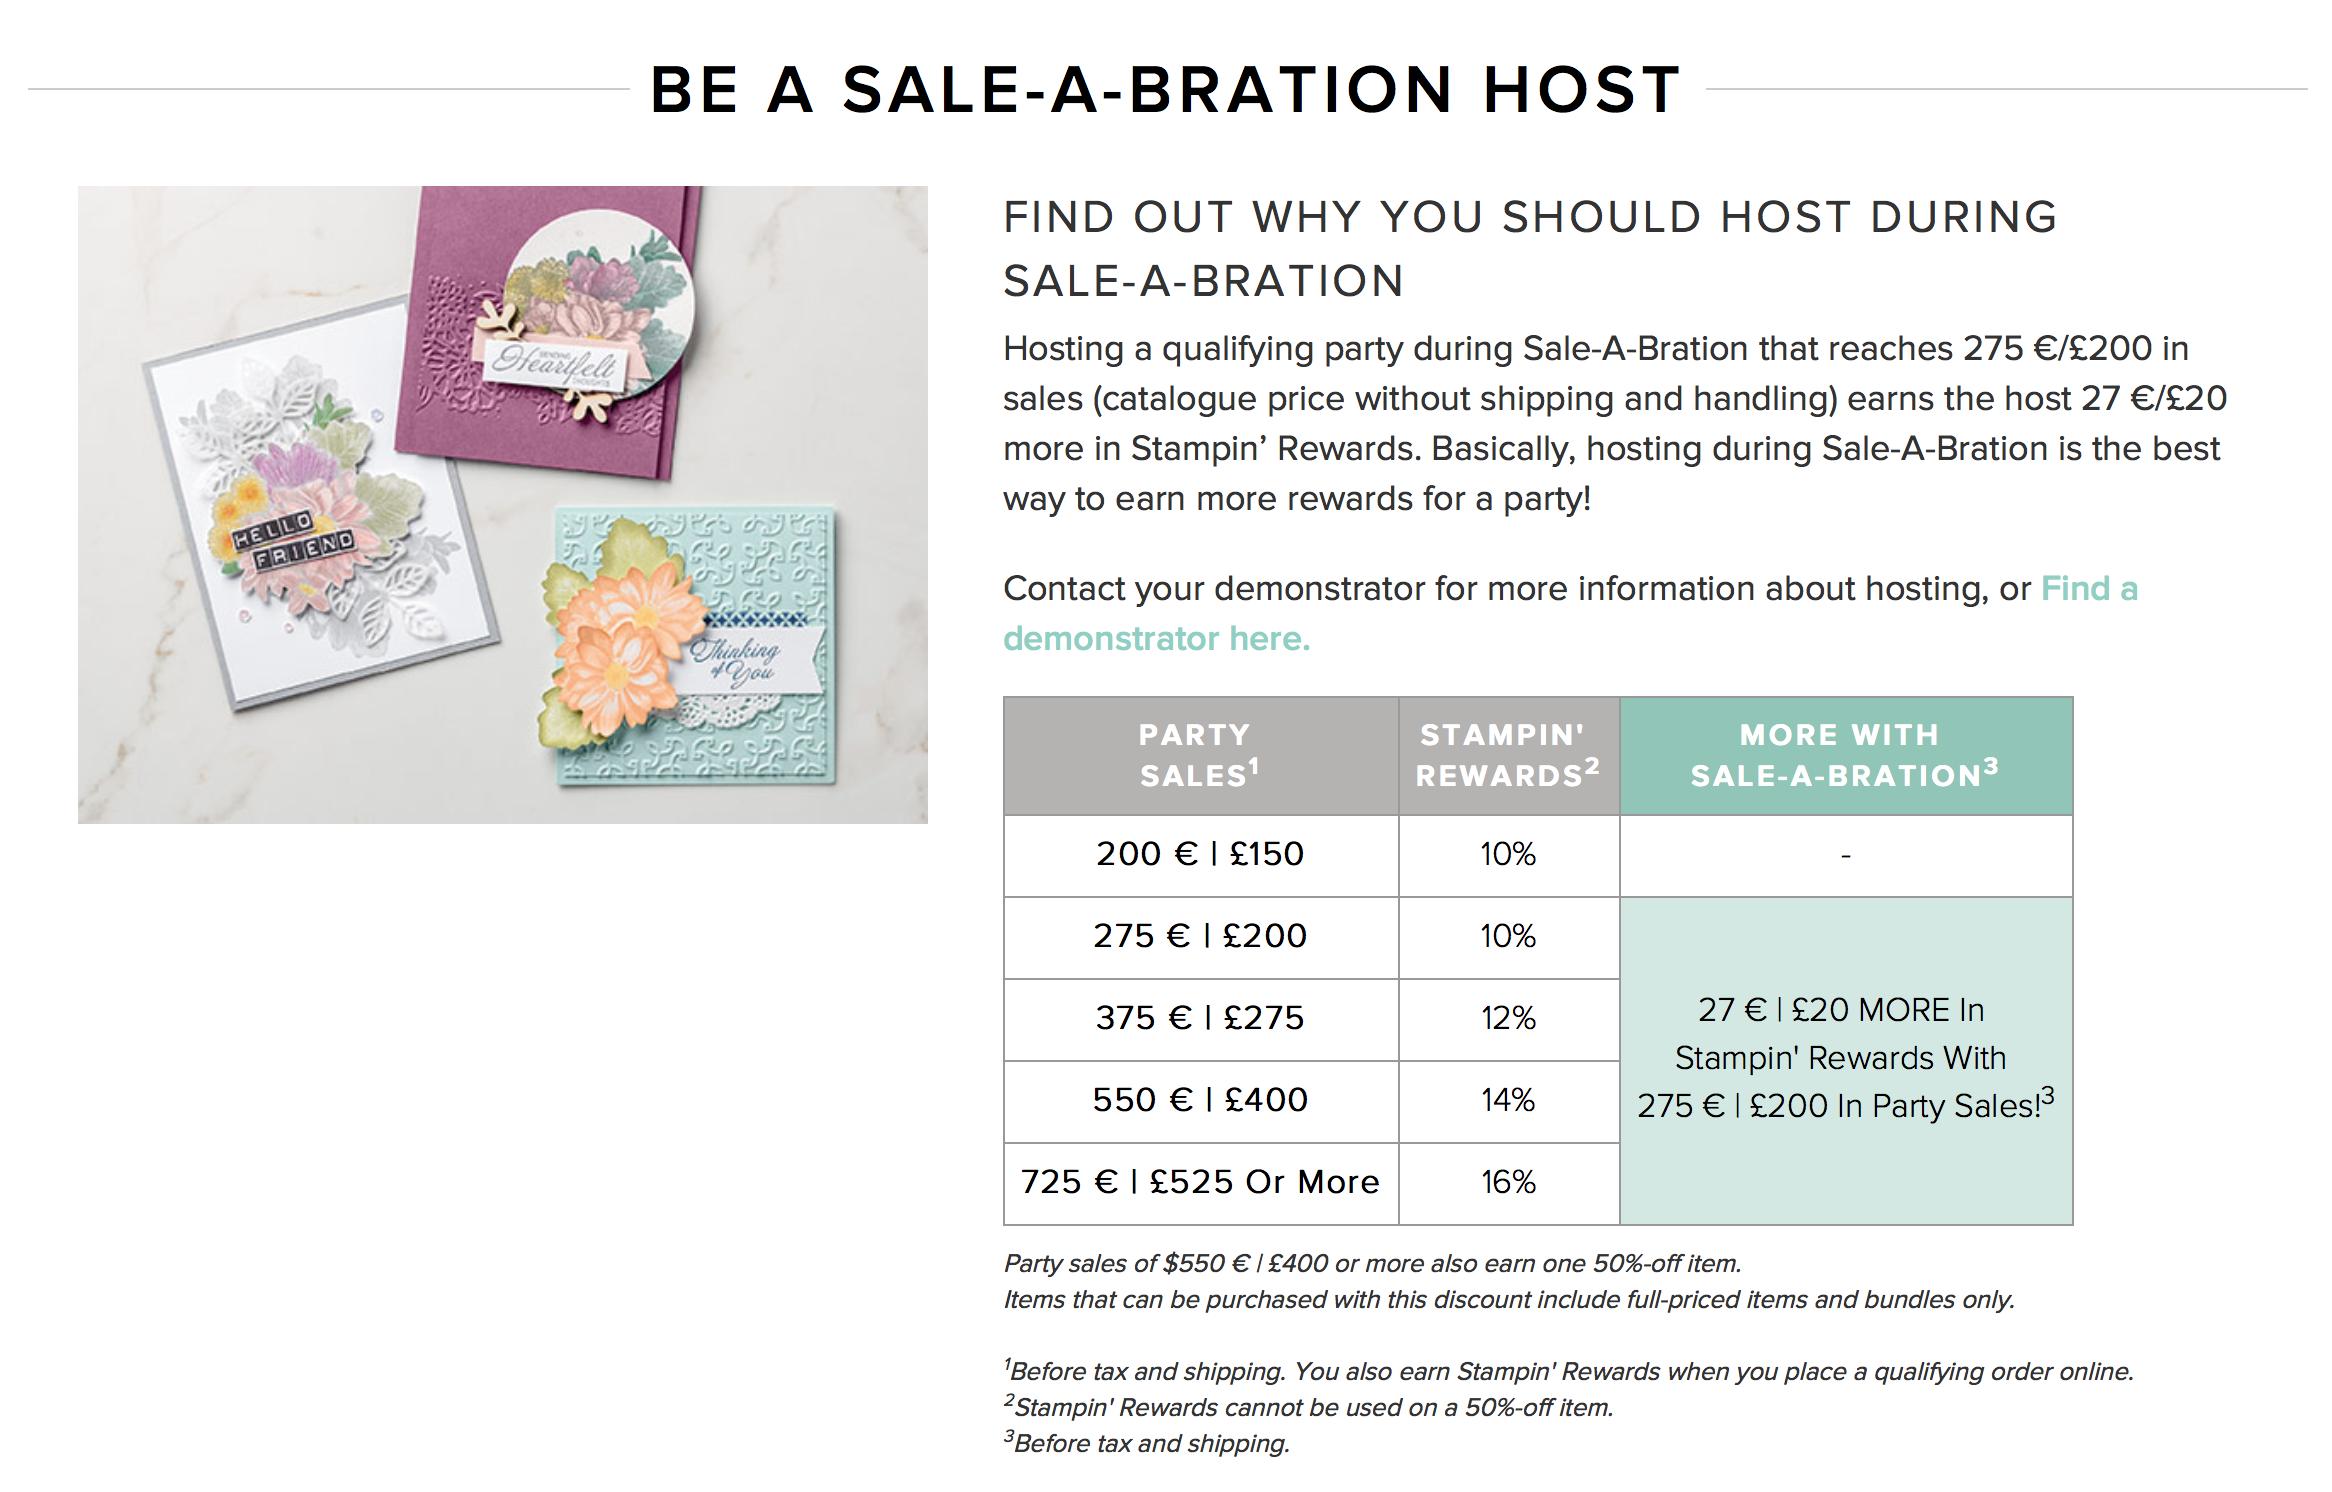 Extra Stampin Rewards in Saleabration